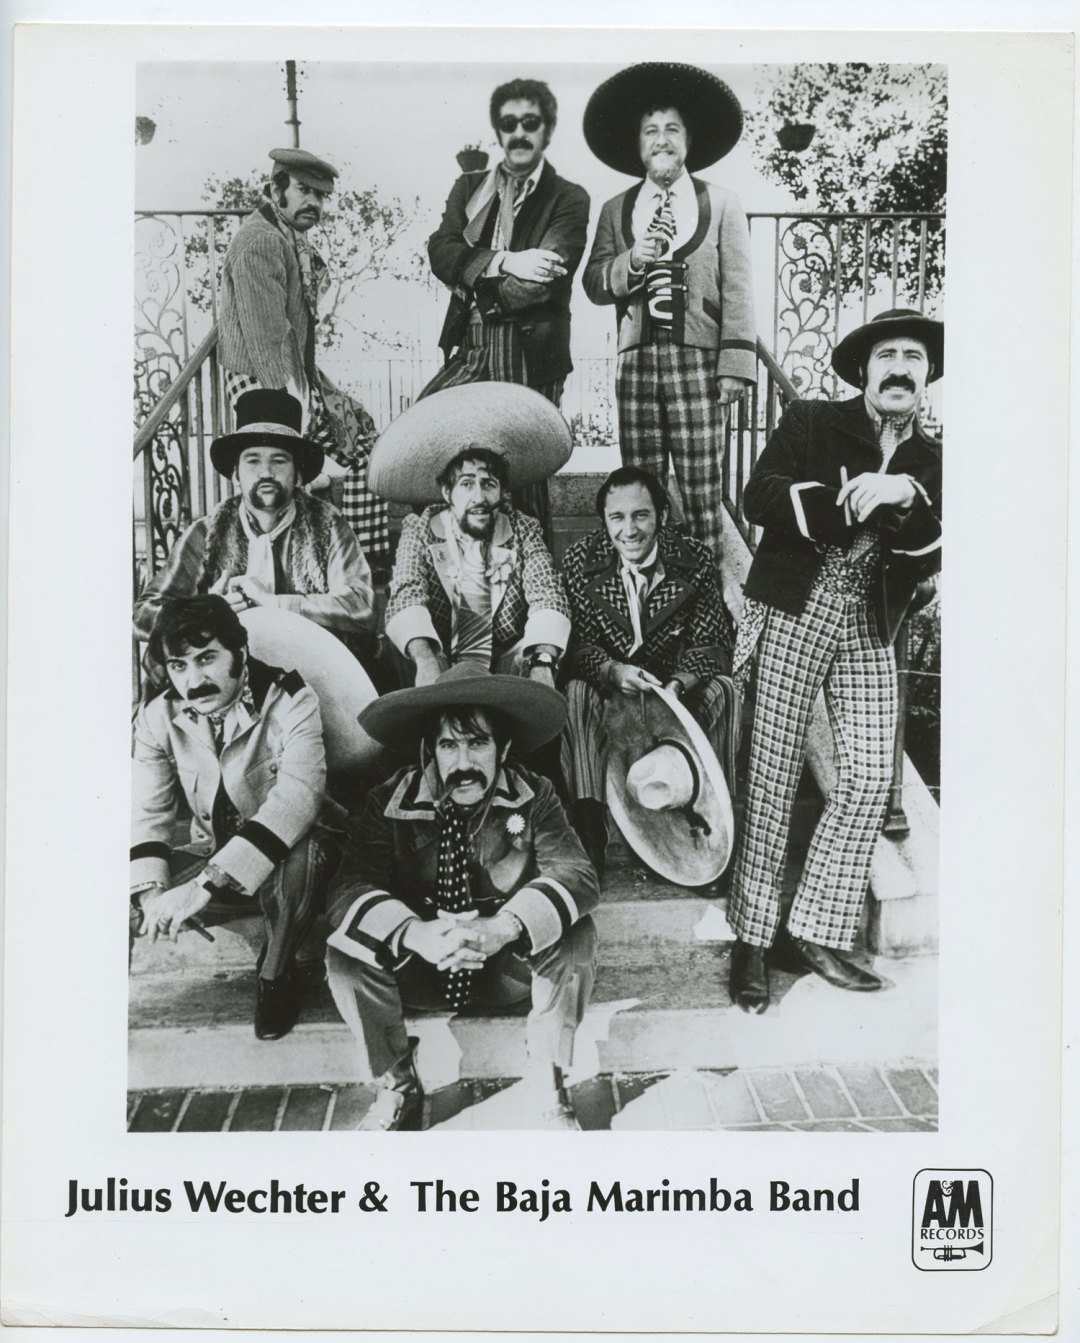 Julius Wechter Baja Marimba Band Photo 1971 Publicity Promo A&M Records